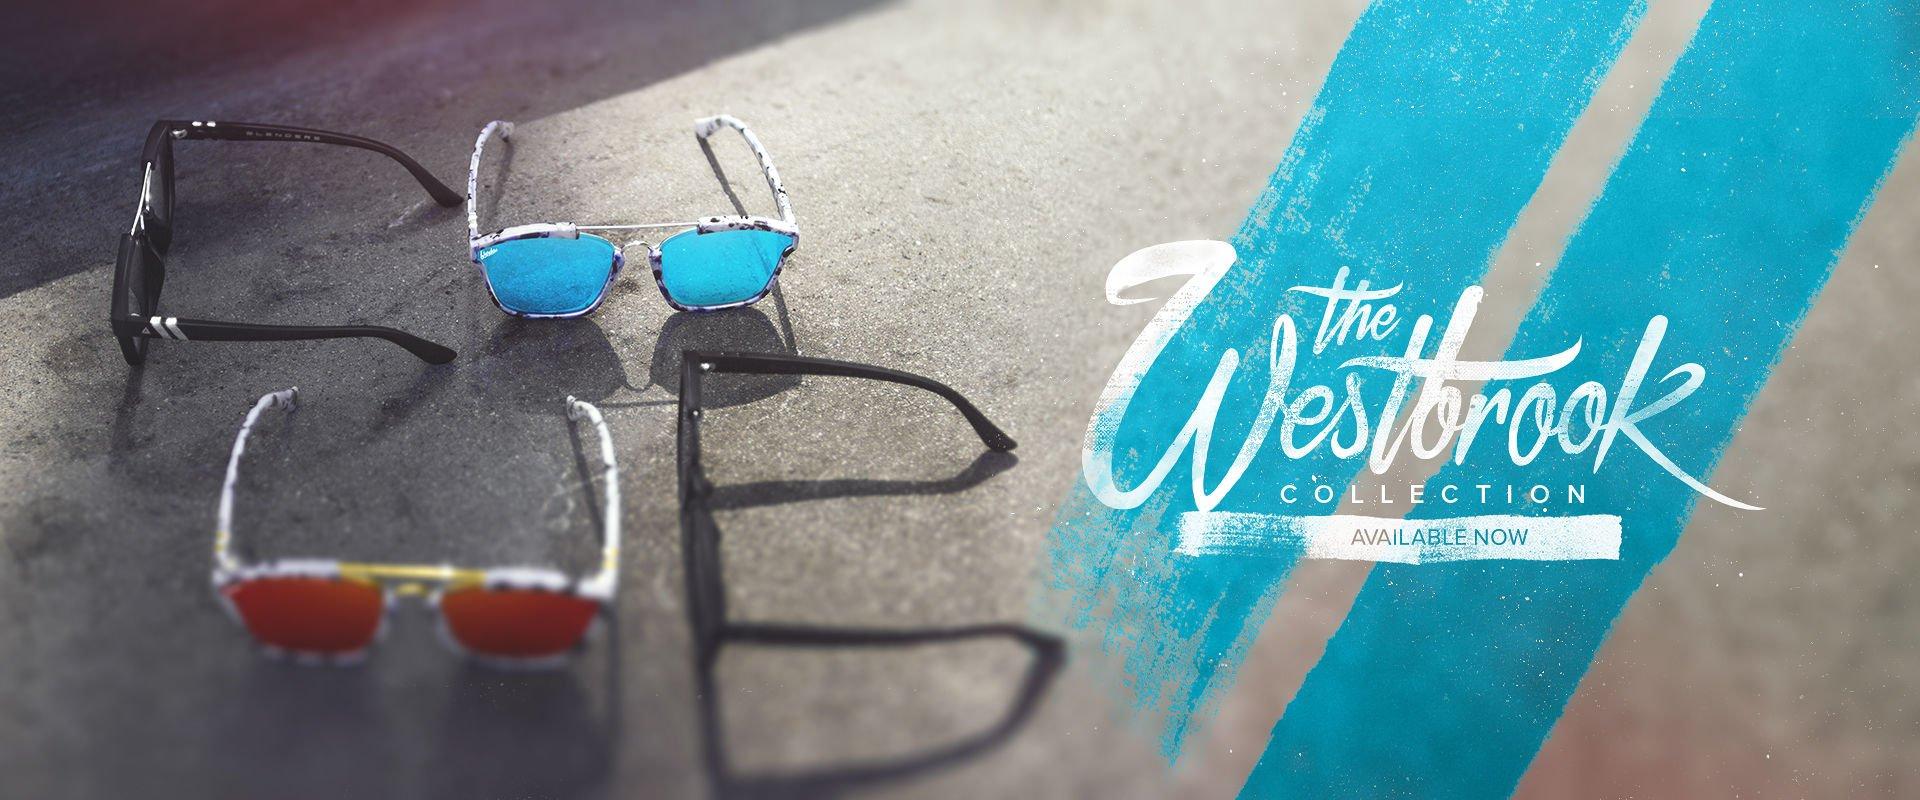 0c21e9fcfe6 WESTBROOK COLLECTION - Blenders Eyewear